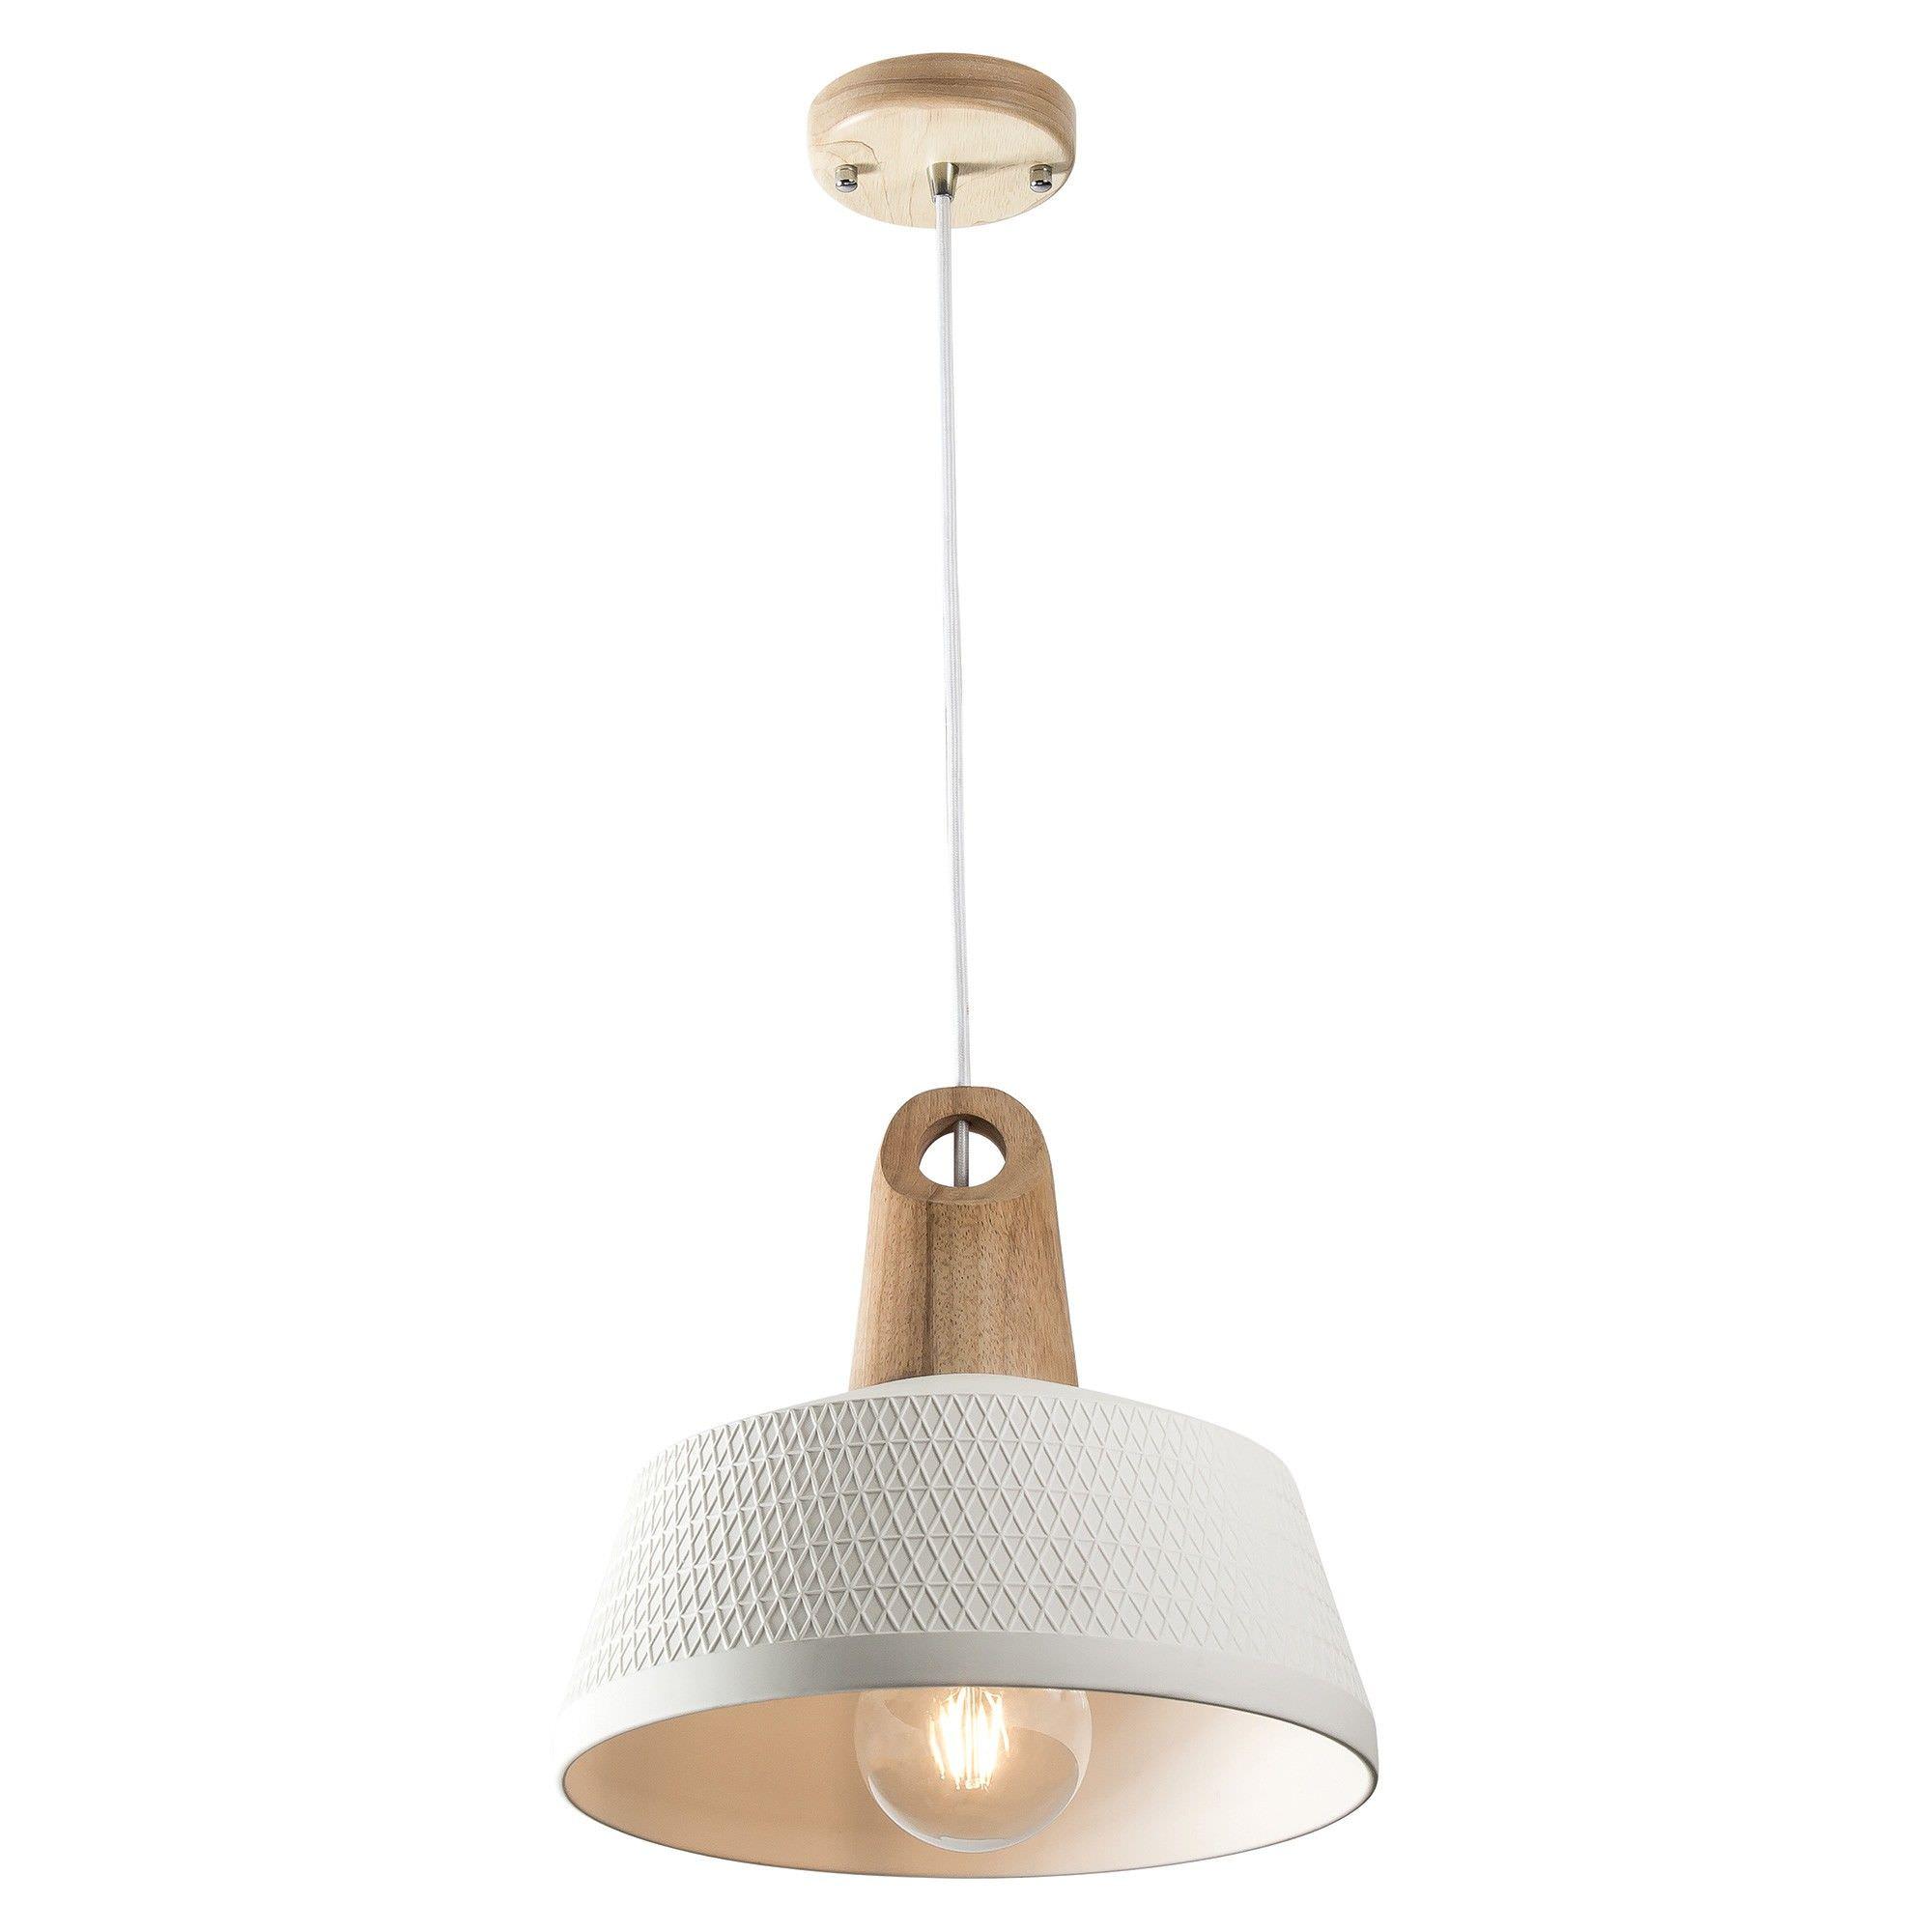 Morrissey Ceramic & Oak Timber Pendant Light, Wide